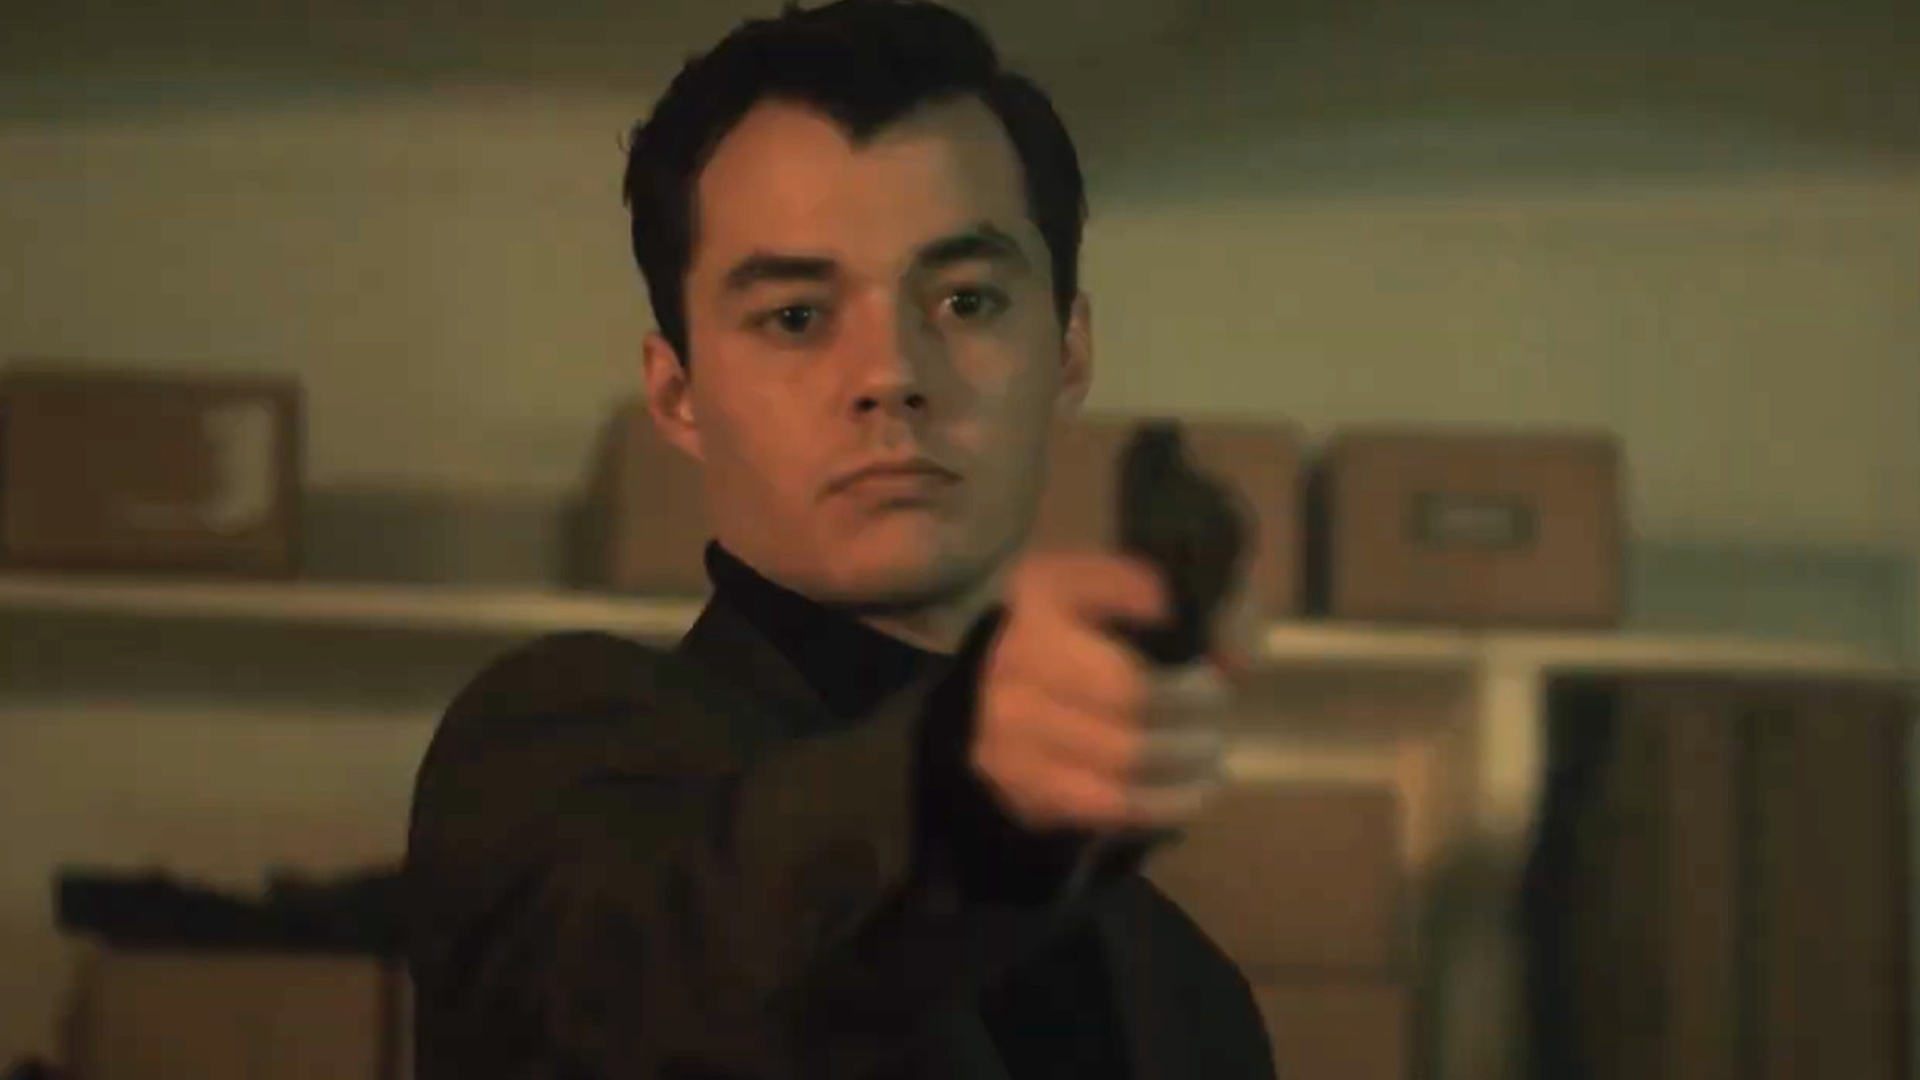 new-trailer-for-dcs-pennyworth-series-sheds-light-on-alfreds-violent-past-social.jpg